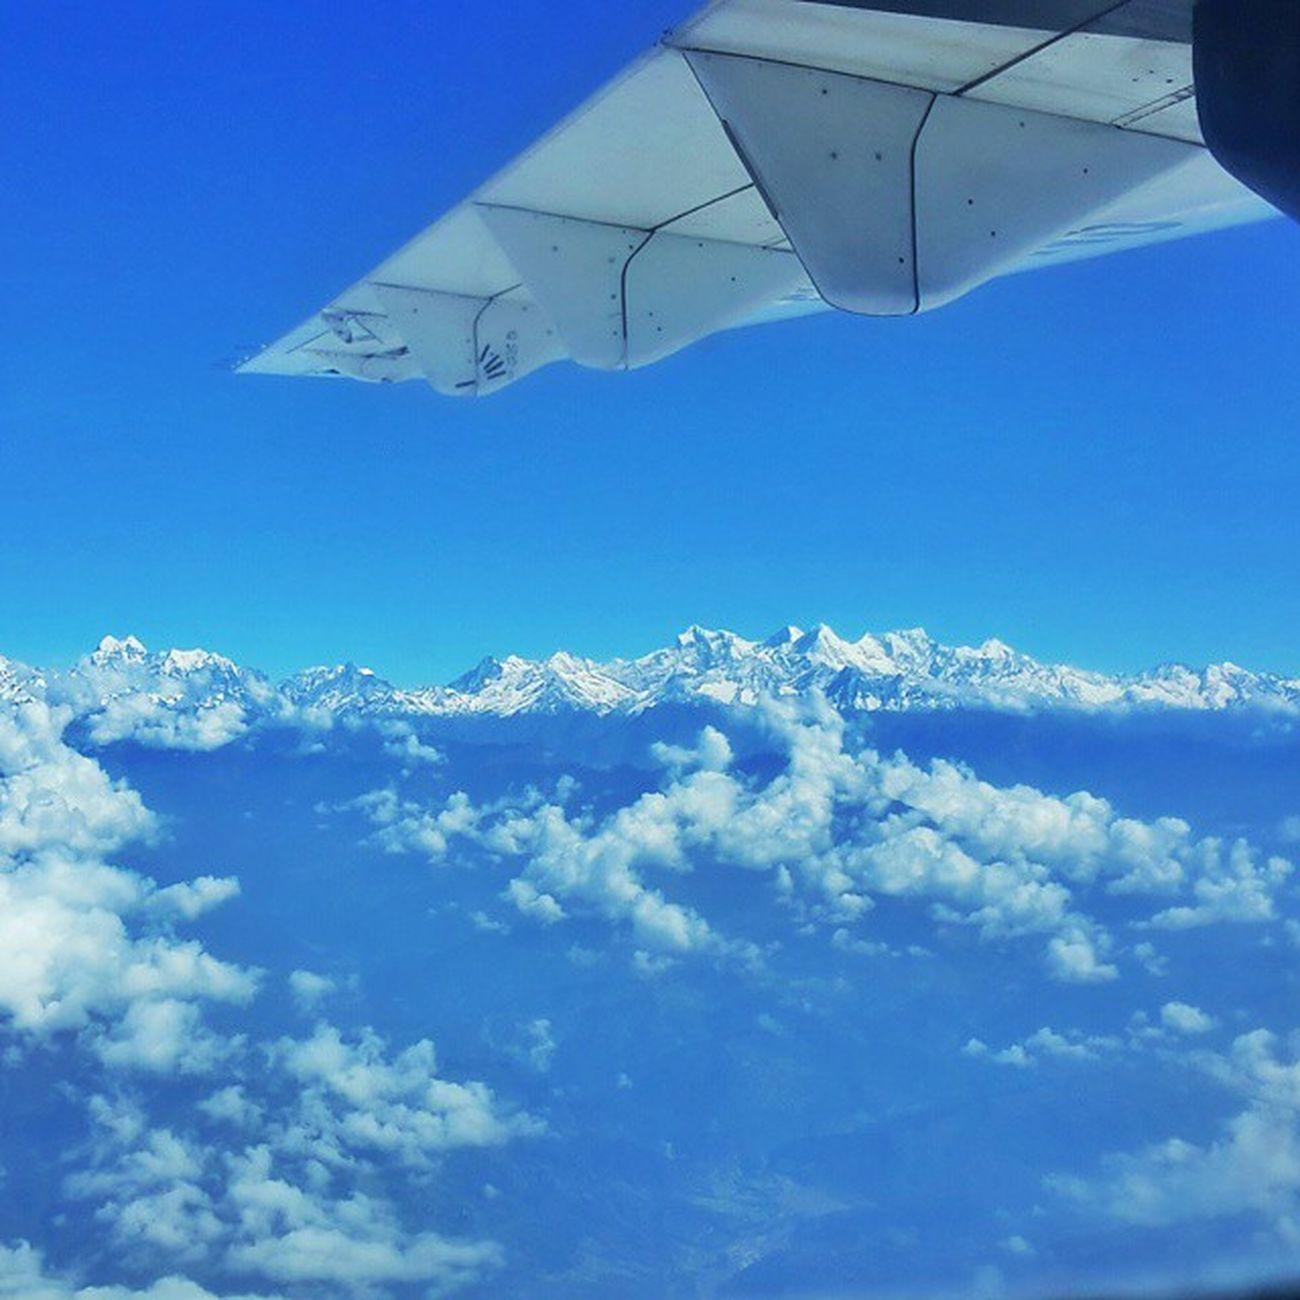 Flight Buddhaair Himalaya Clouds nepal nepali instanepal instadaily instaphoto ig_nepal instaasia pokhara kathmandu photooftheday blue sky beautifulday bestoftheday moments follow picoftheday igdaily ig_snapshots follow freeyourmind